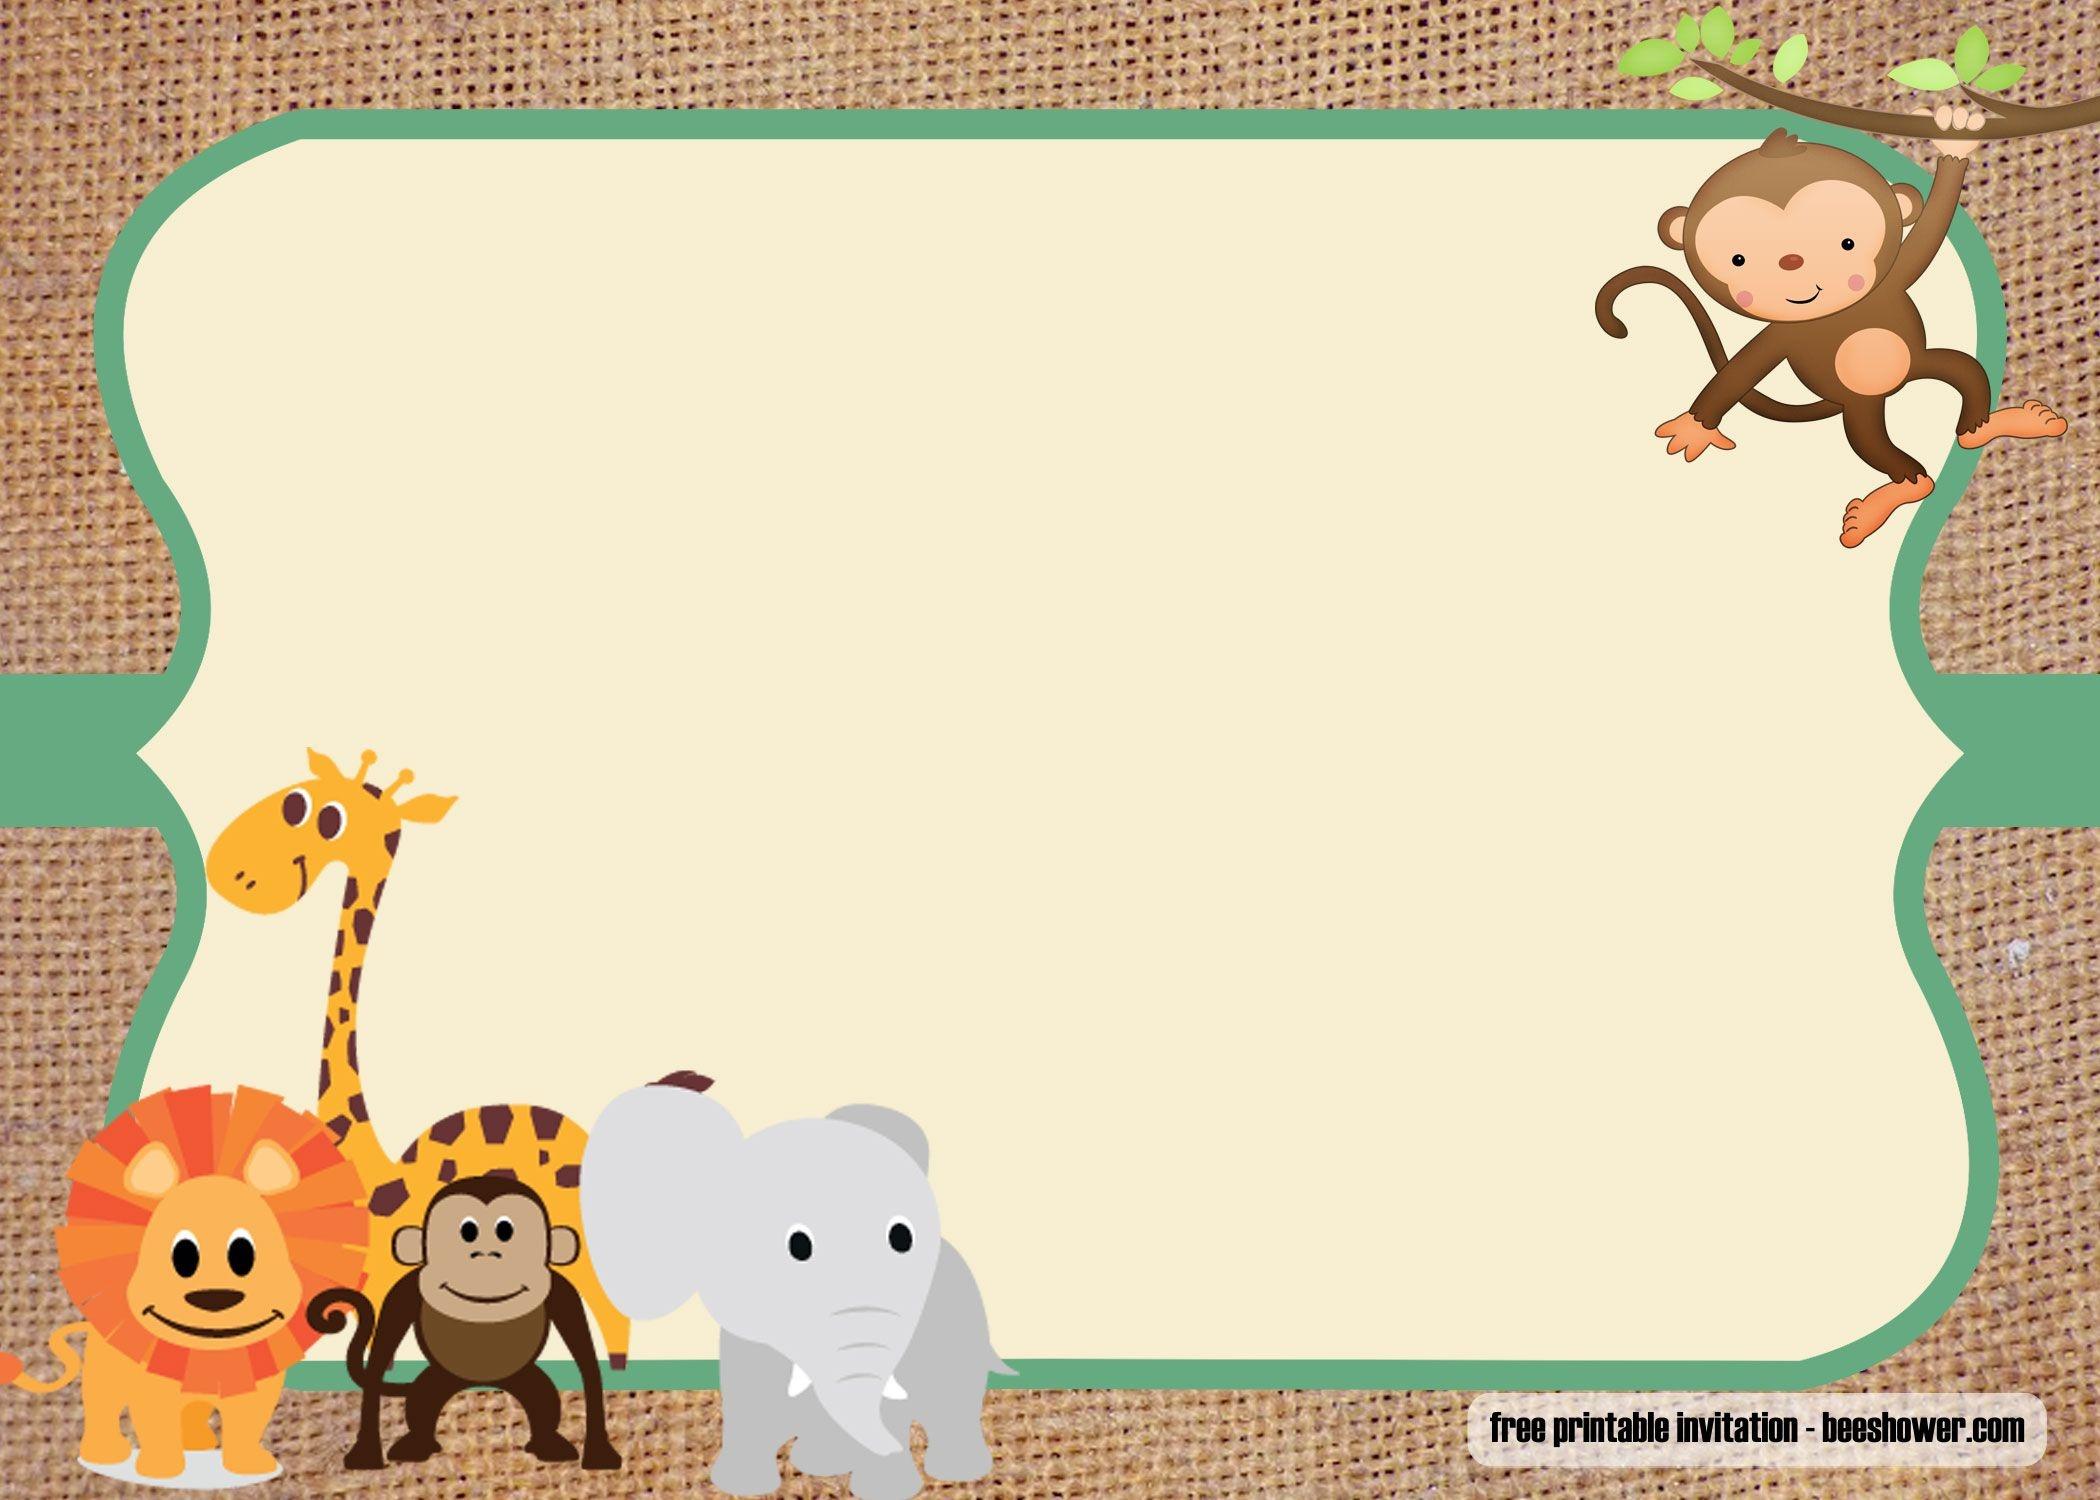 Free Safari Theme Baby Shower Invitations Templates | Free Printable - Jungle Theme Birthday Invitations Free Printable